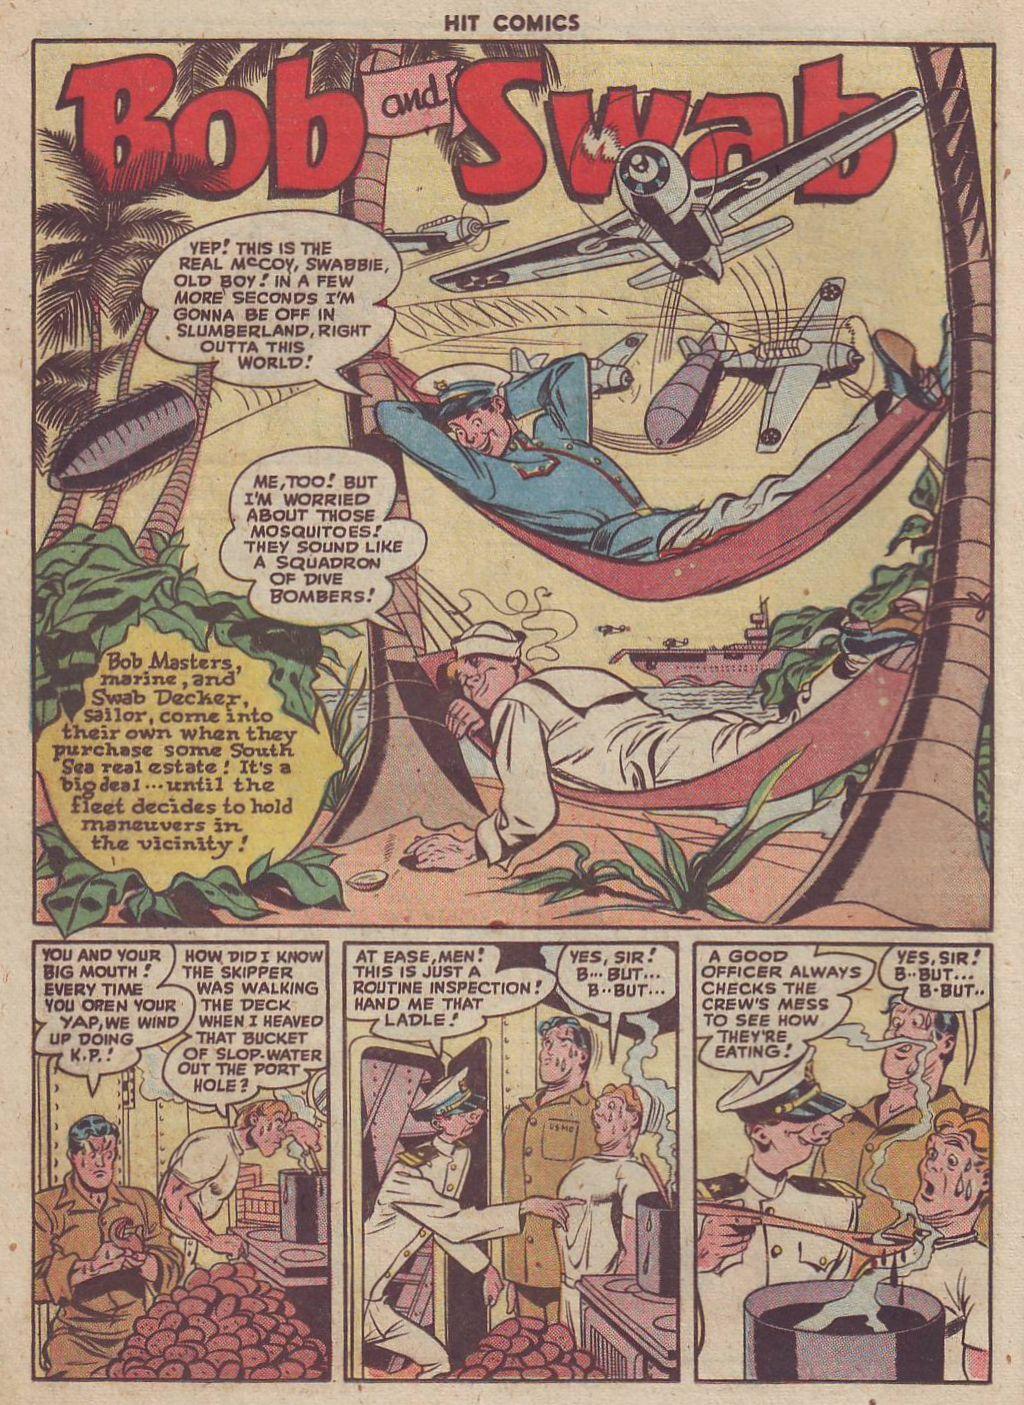 Read online Hit Comics comic -  Issue #51 - 16